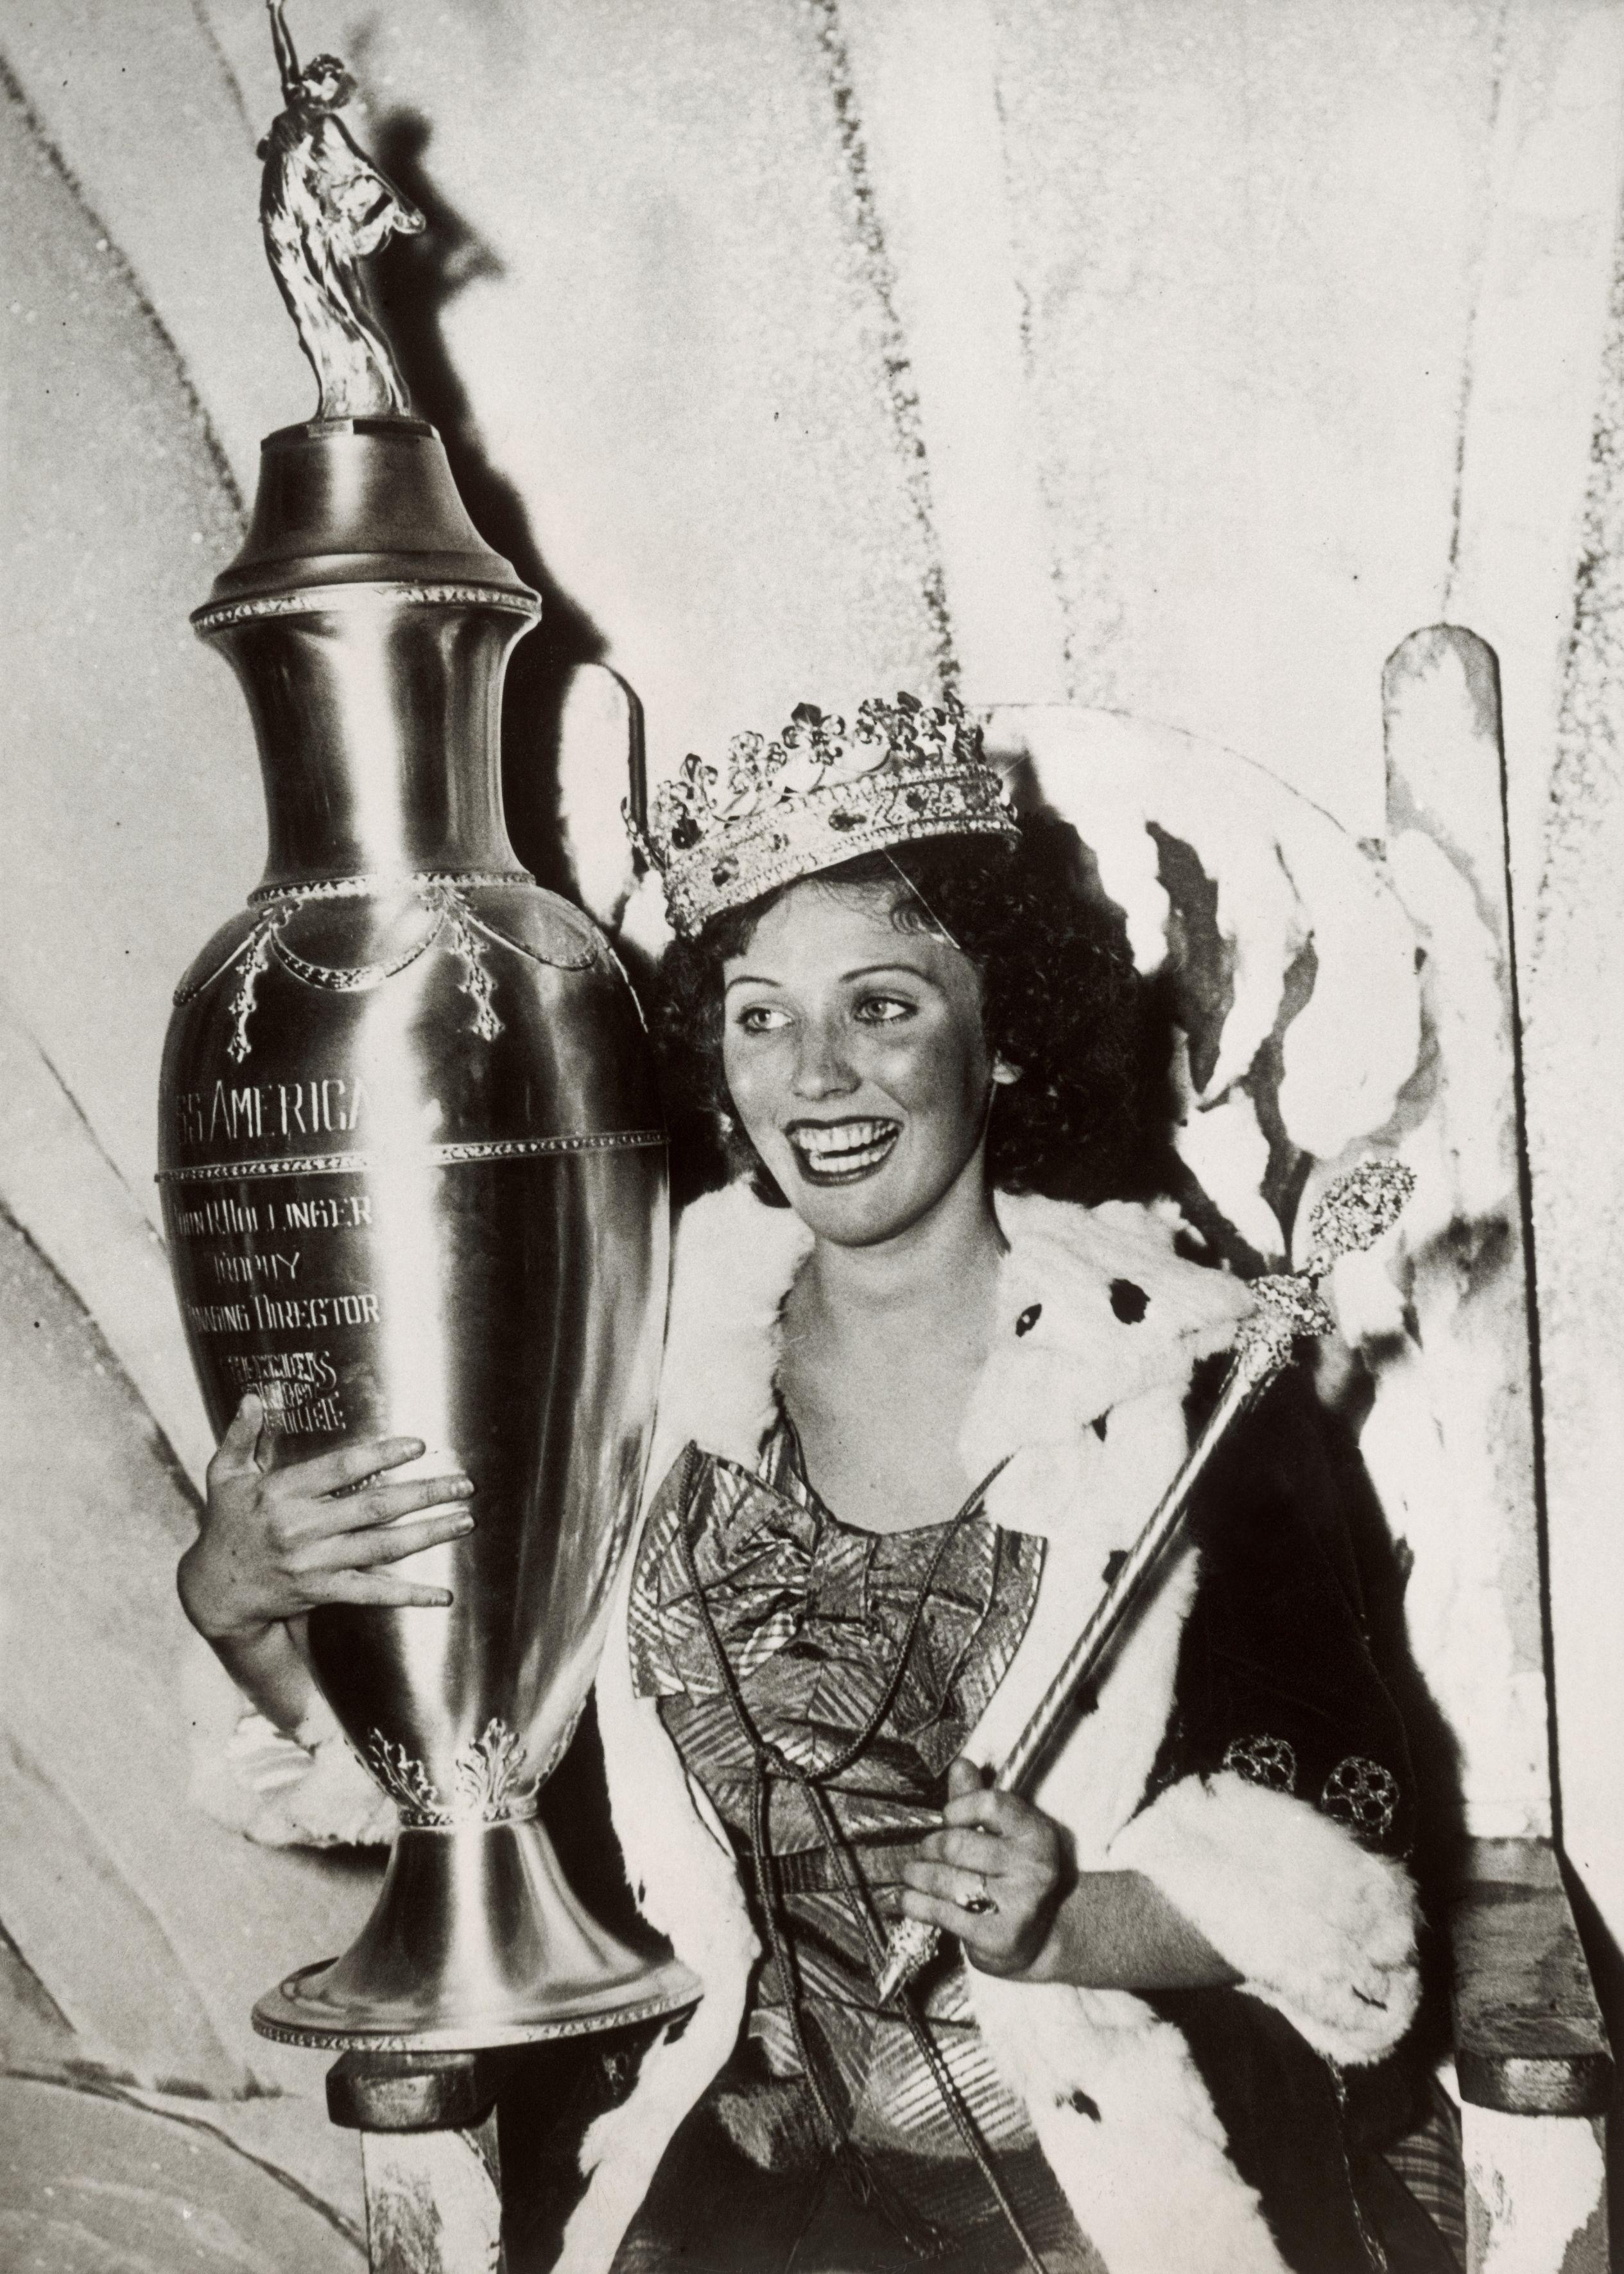 1935: Henrietta Leaver from Pittsburgh